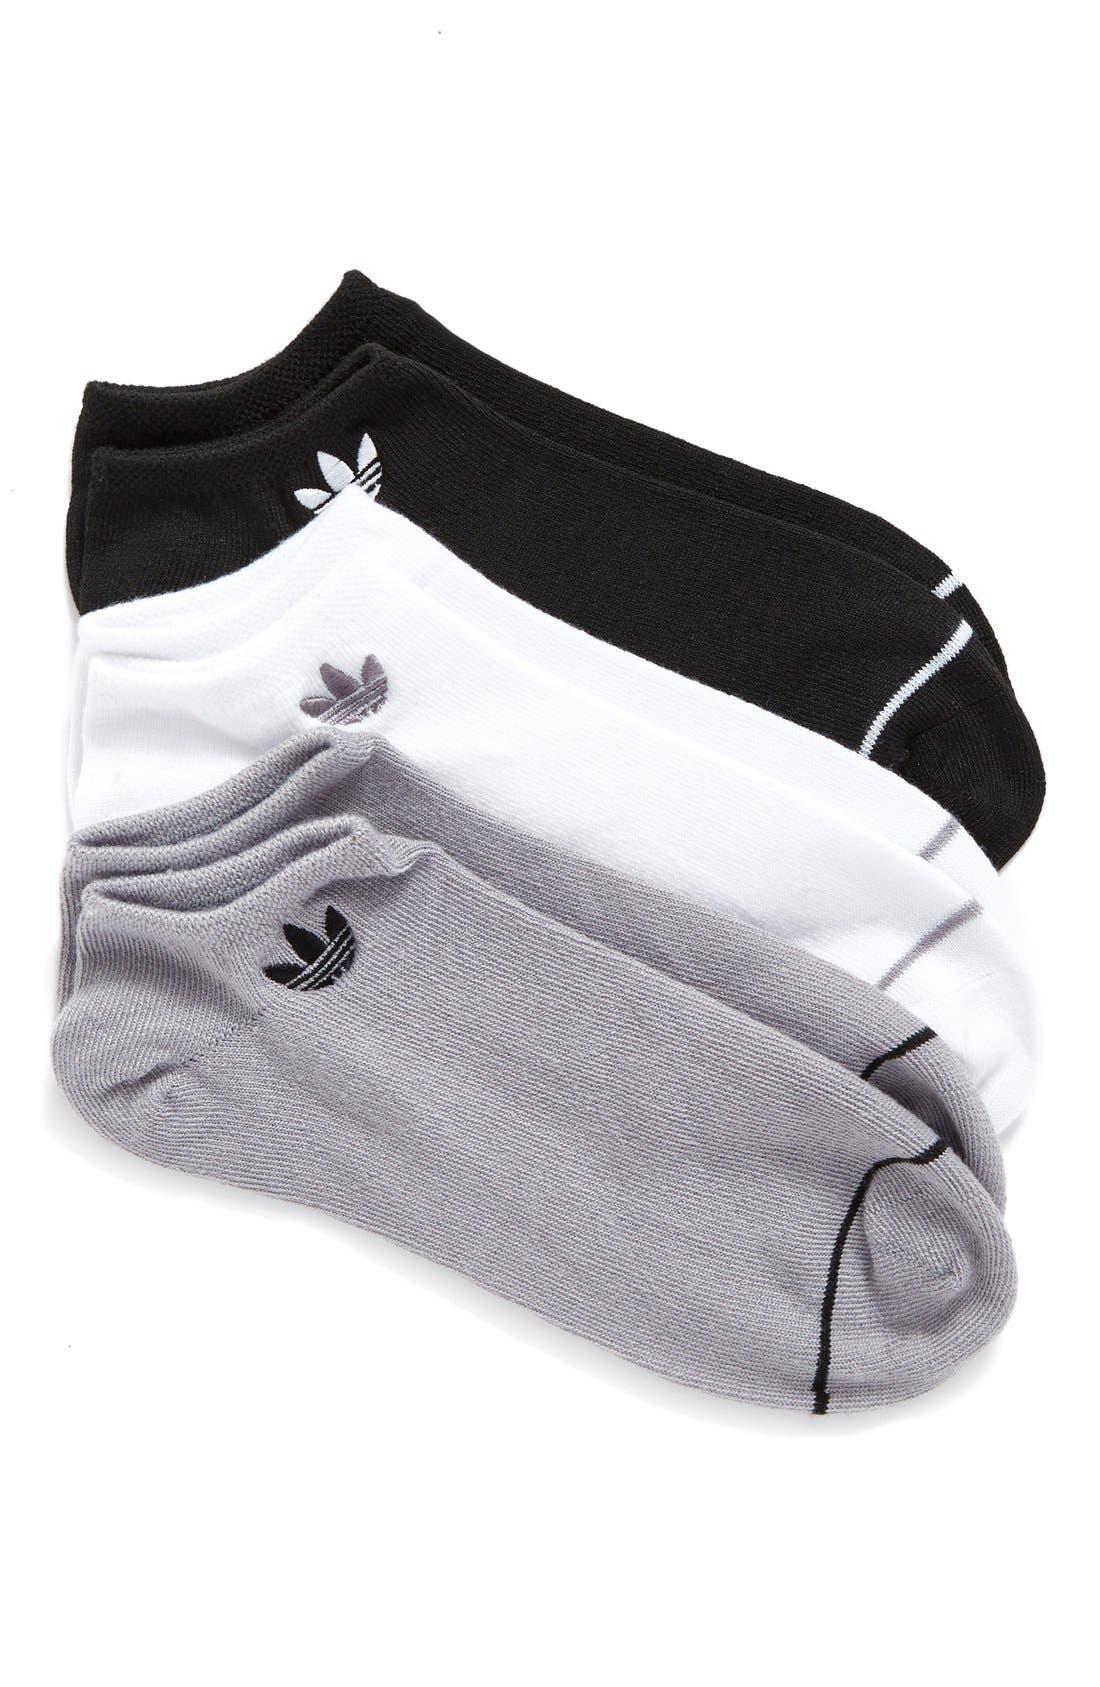 Alternate Image 1 Selected - adidas Superlite 3-Pack Socks